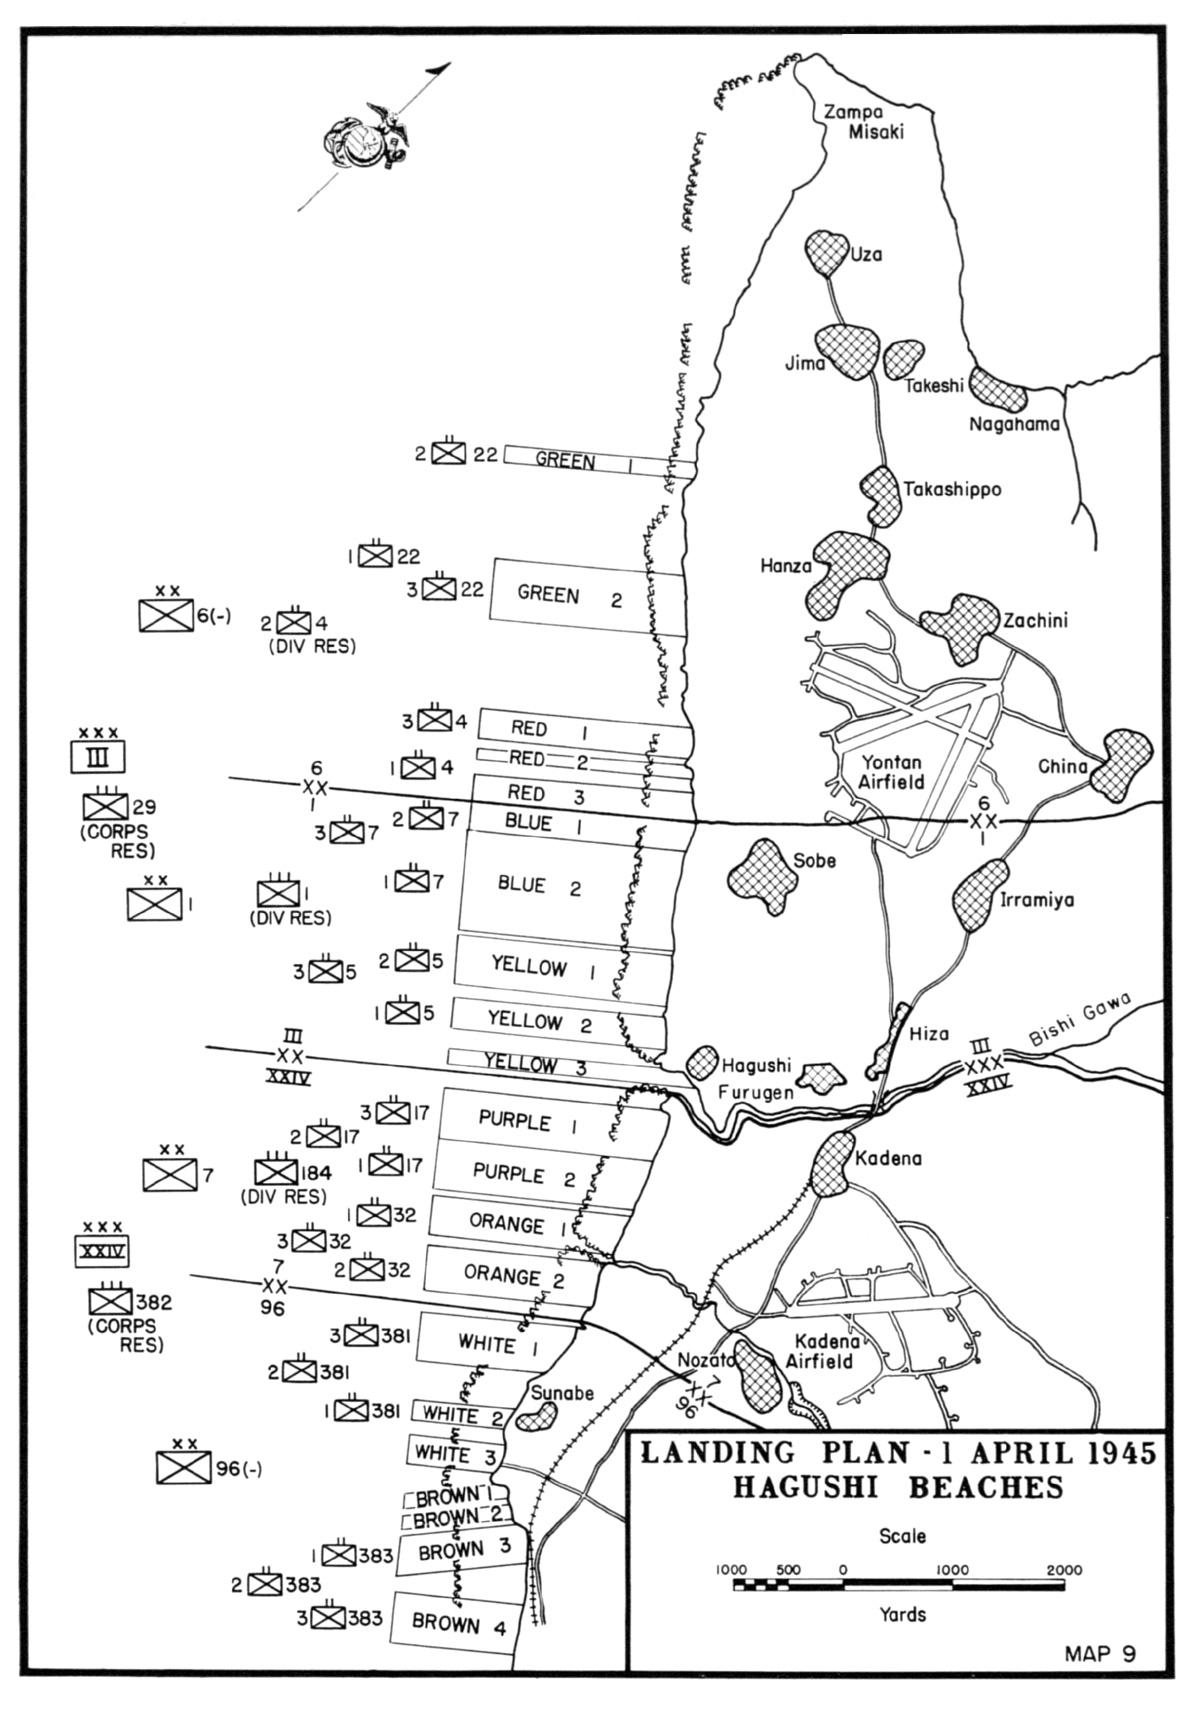 Map Map Of Landing Beaches On Okinawa Japan 1 Apr